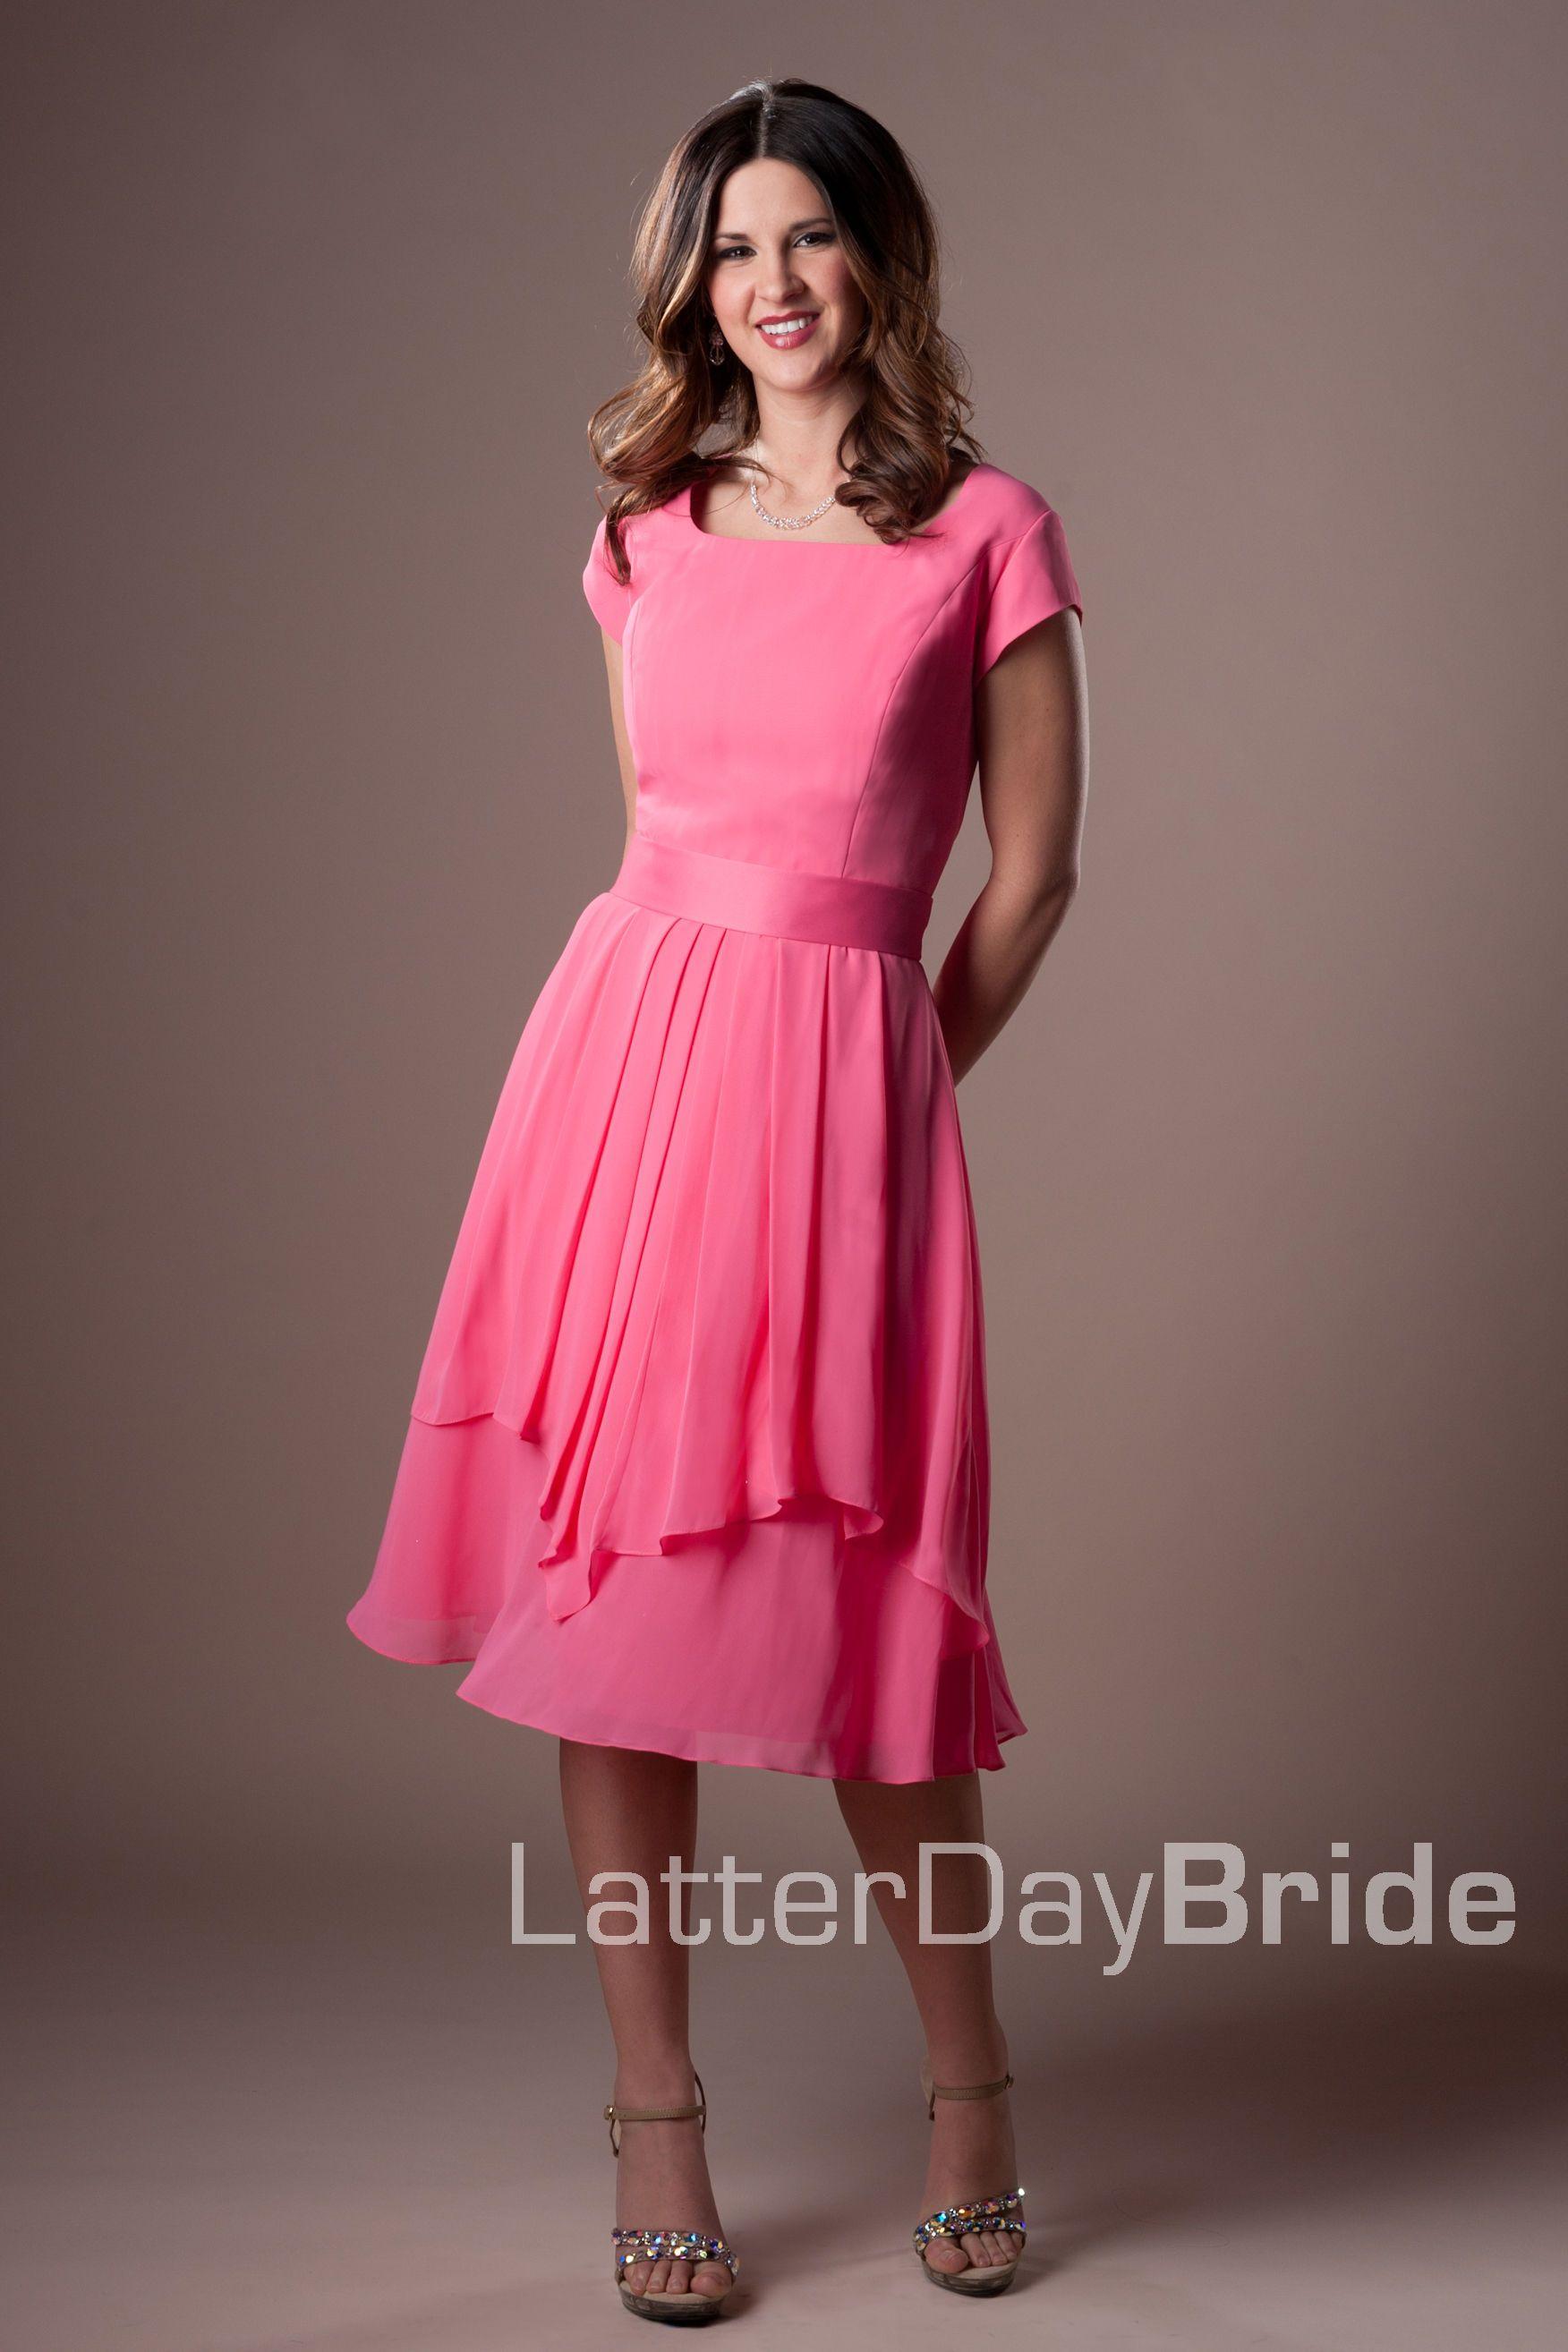 Bridesmaid & Prom, Mariam   LatterDayBride & Prom Modest Mormon LDS ...